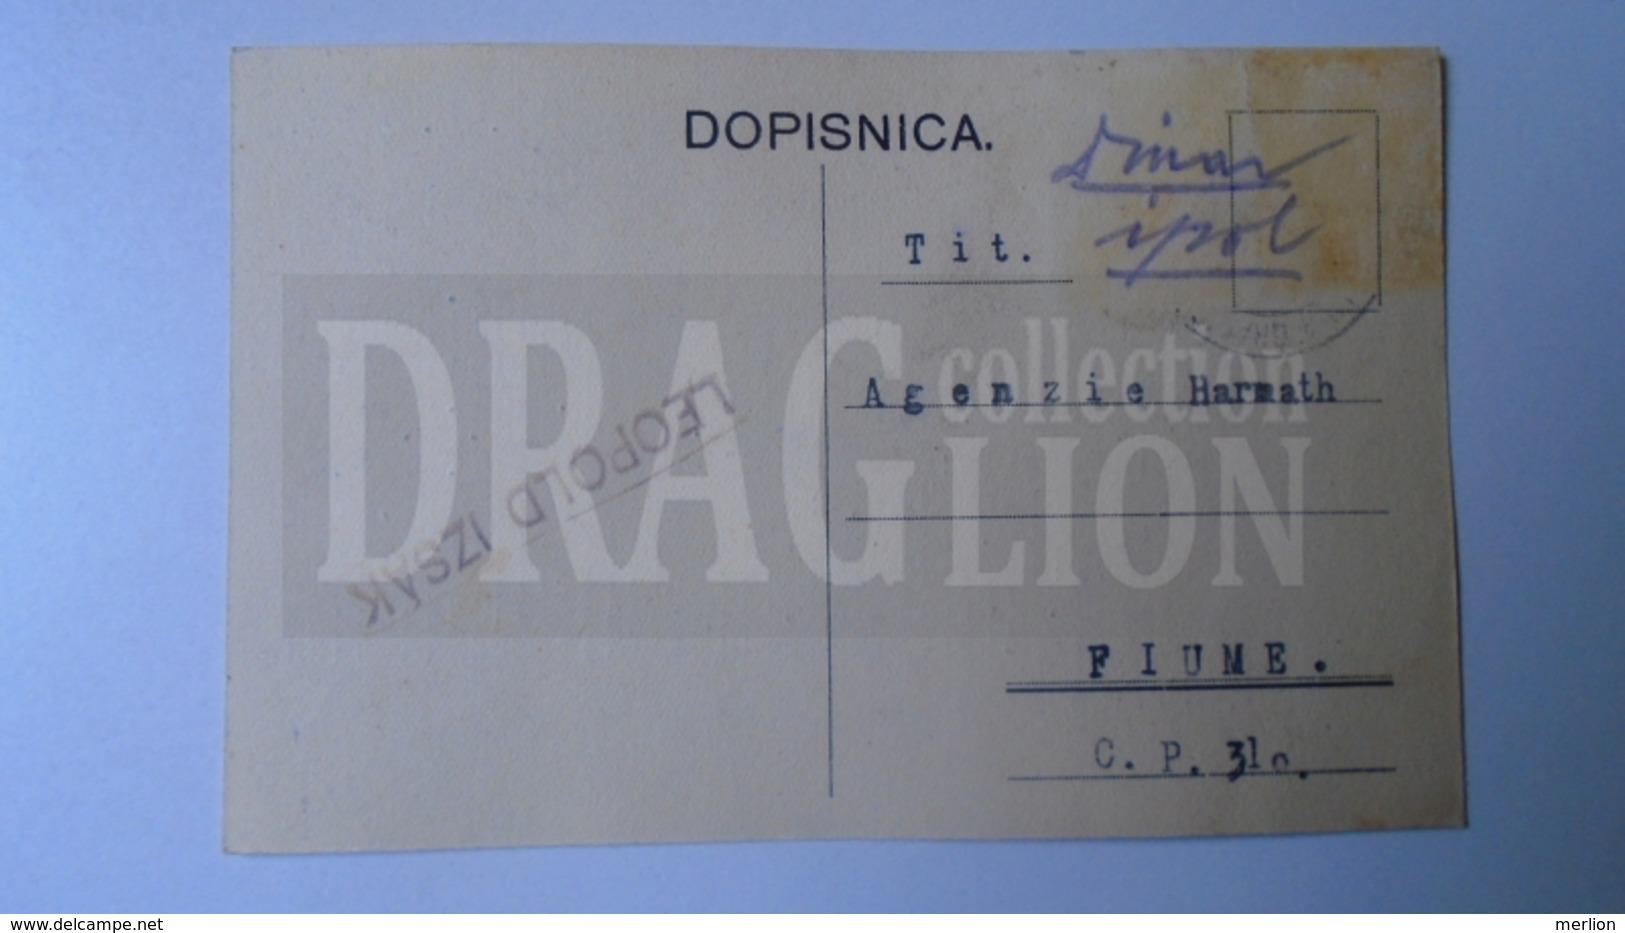 D159879   Commercial Postcard - Leopold IZSAK -Nova Gradiska (Slavonija)    - Sent To Agenzia Harmath  FIUME  1926 - Italia